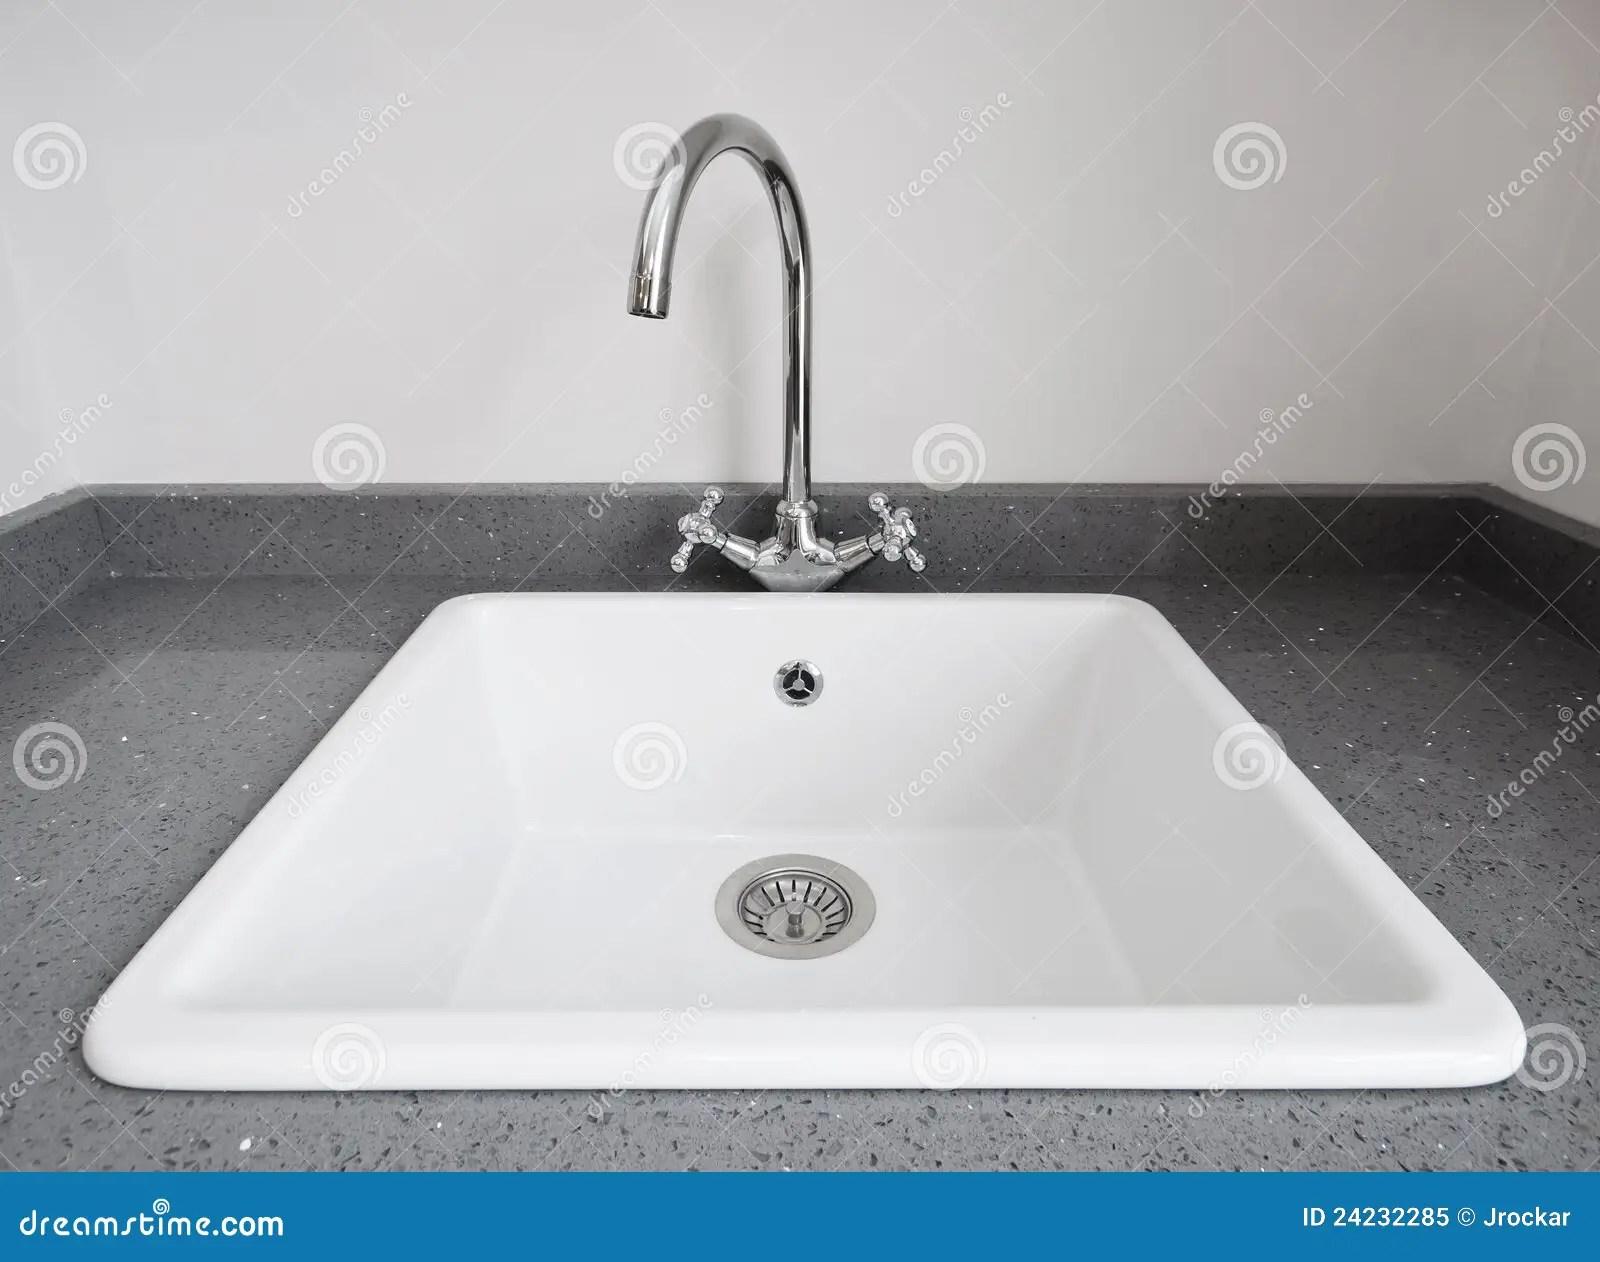 24 kitchen sink cabinet hardware placement 厨房减速火箭的水槽库存图片 图片包括有石头 减速火箭 形状 内部 厨房减速火箭的水槽